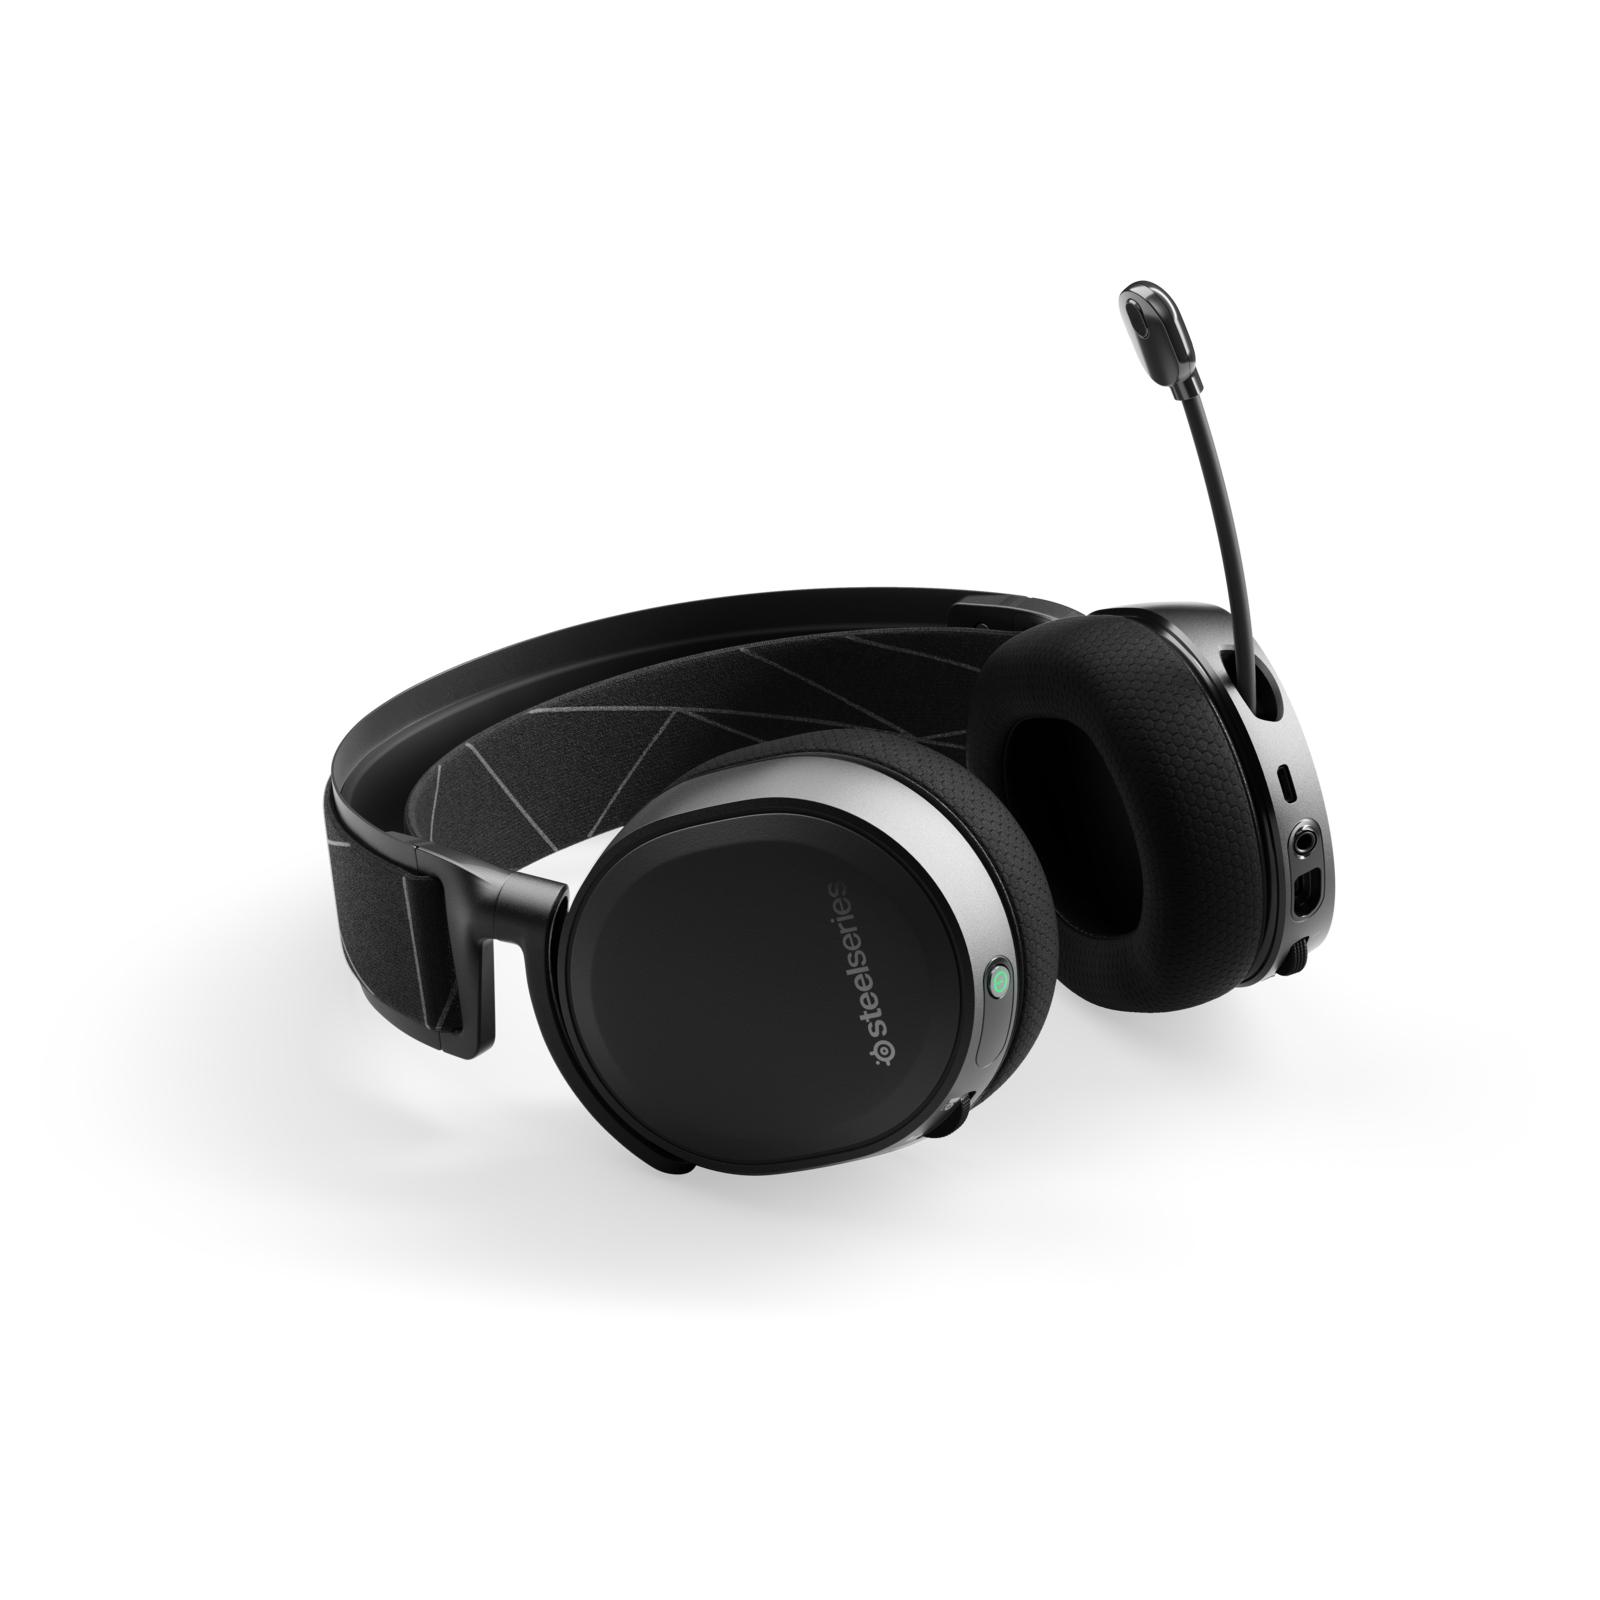 Наушники SteelSeries Arctis 7 Black 2019 Edition (61505) изображение 4